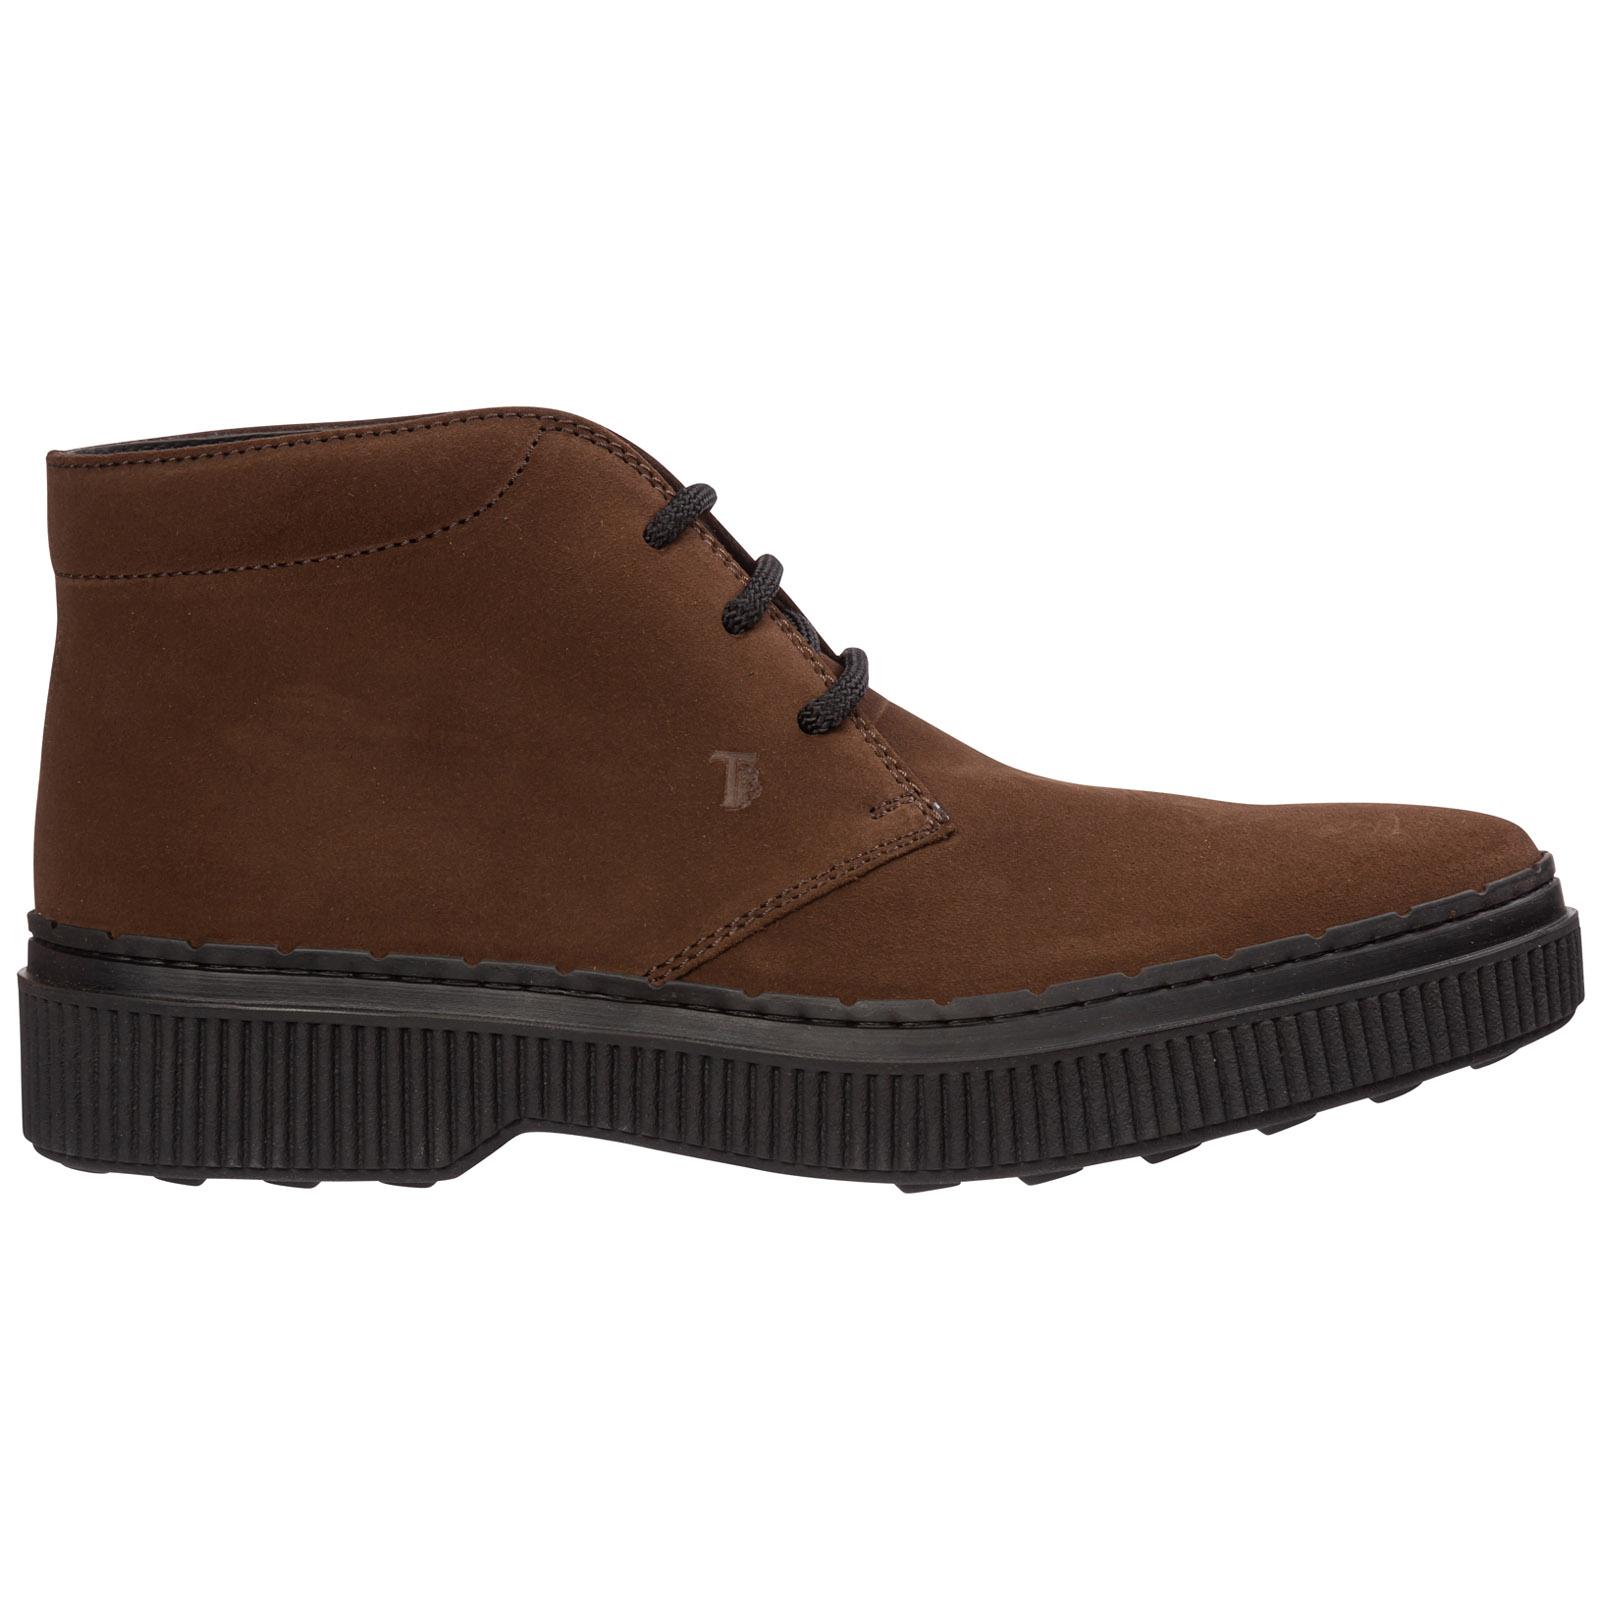 premium selection 88af2 2c0b0 Polacchine stivaletti scarpe uomo camoscio